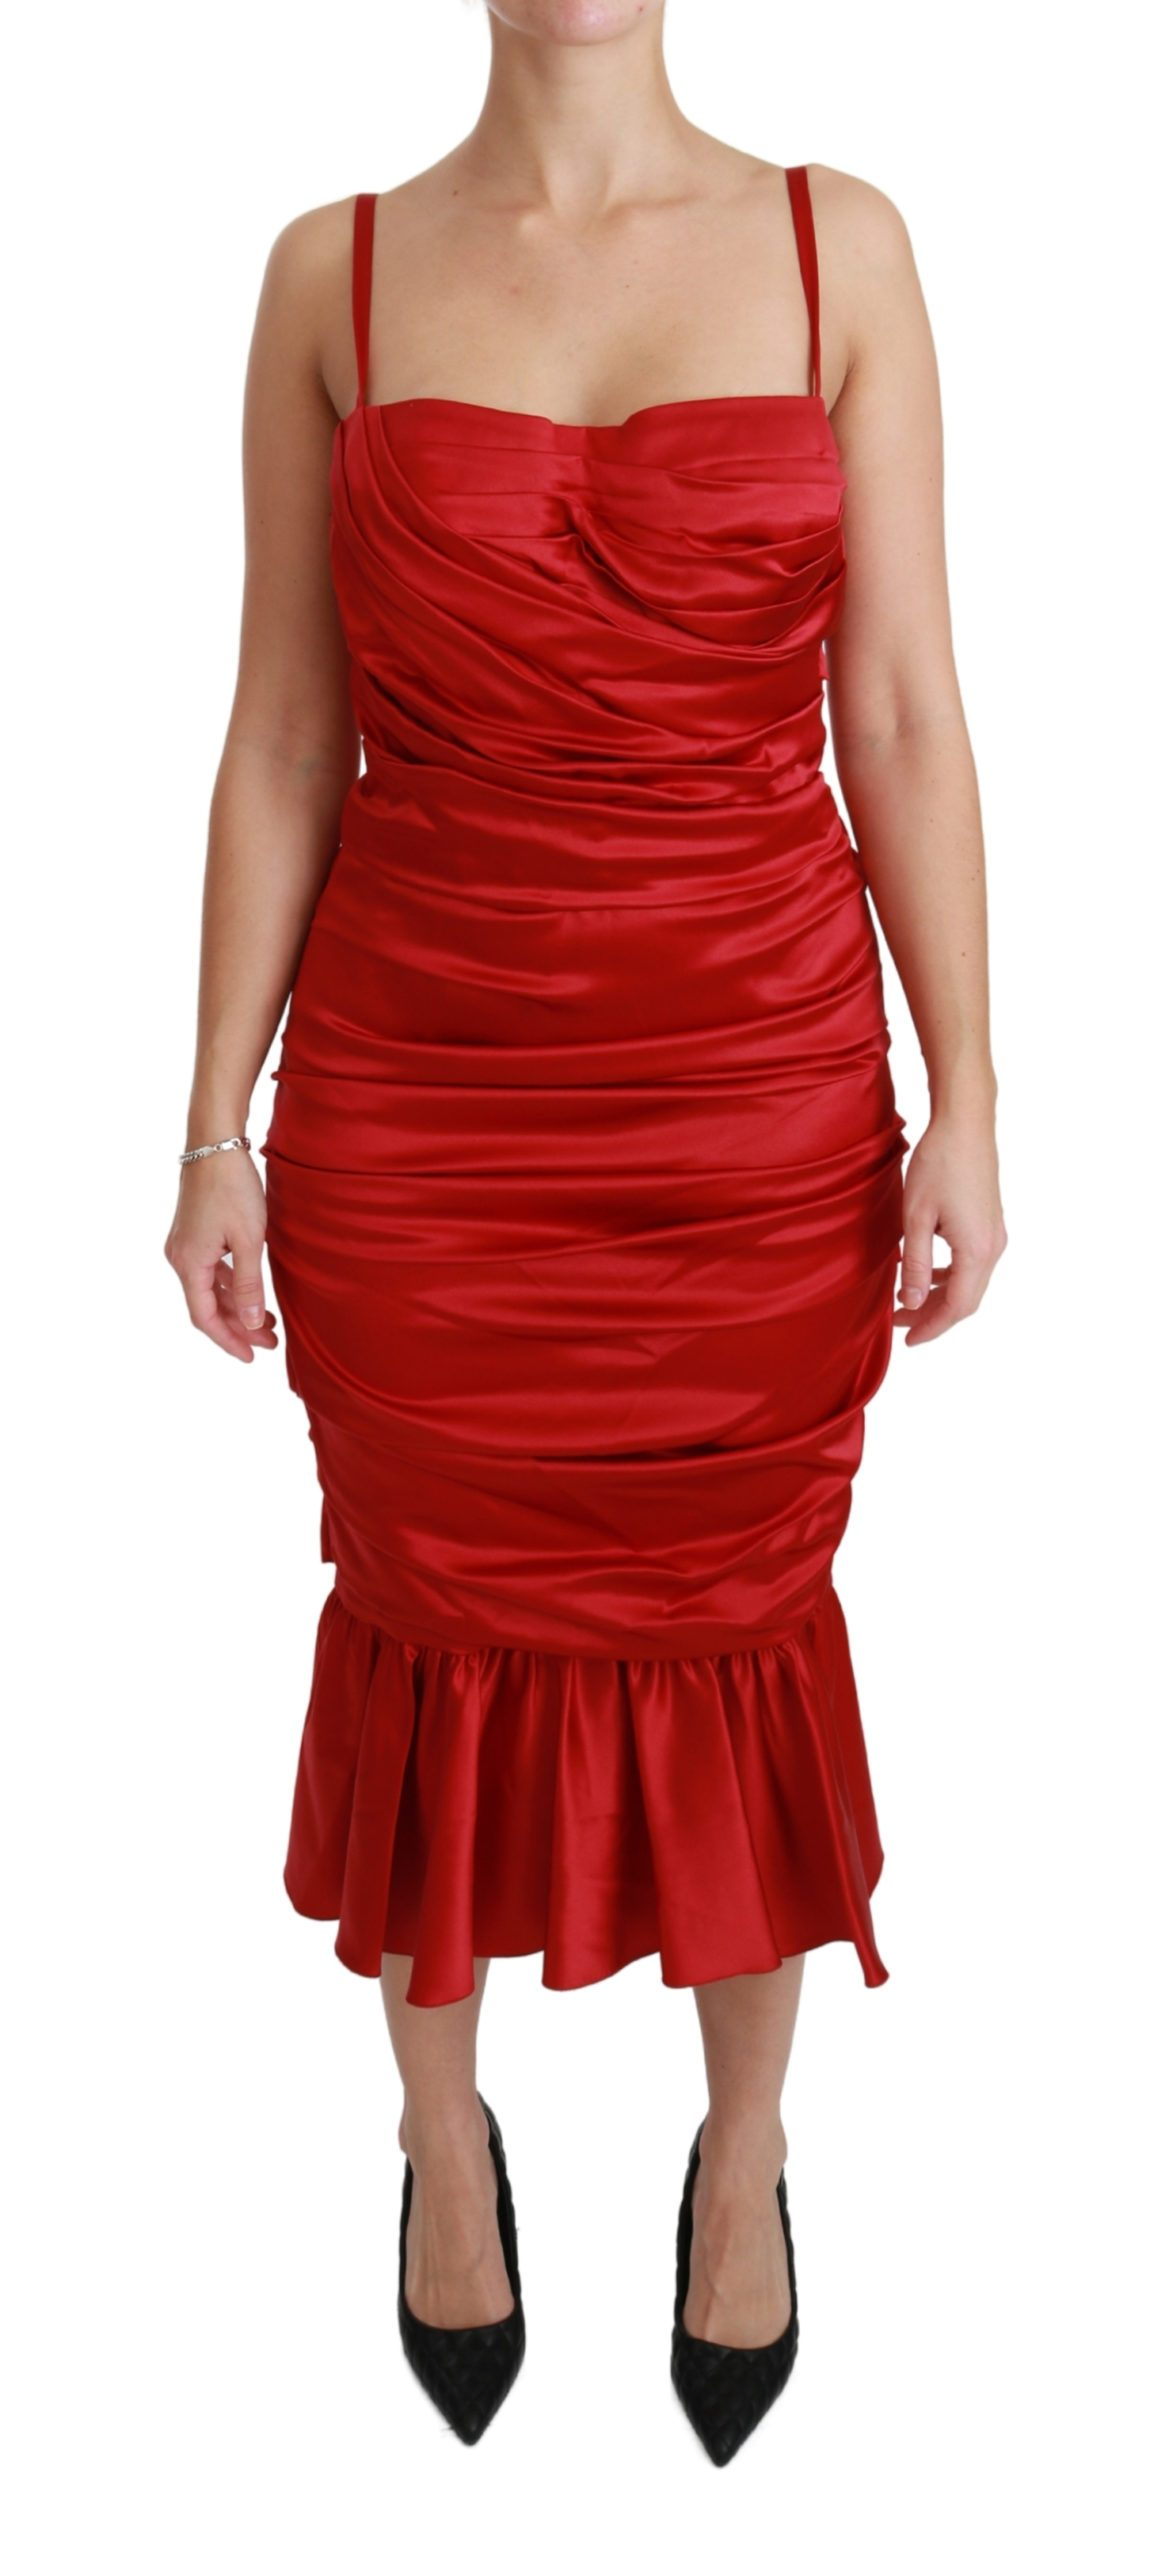 Dolce & Gabbana Women's Silk Stretch Mermaid Dress Red DR2459 - IT36 | XS